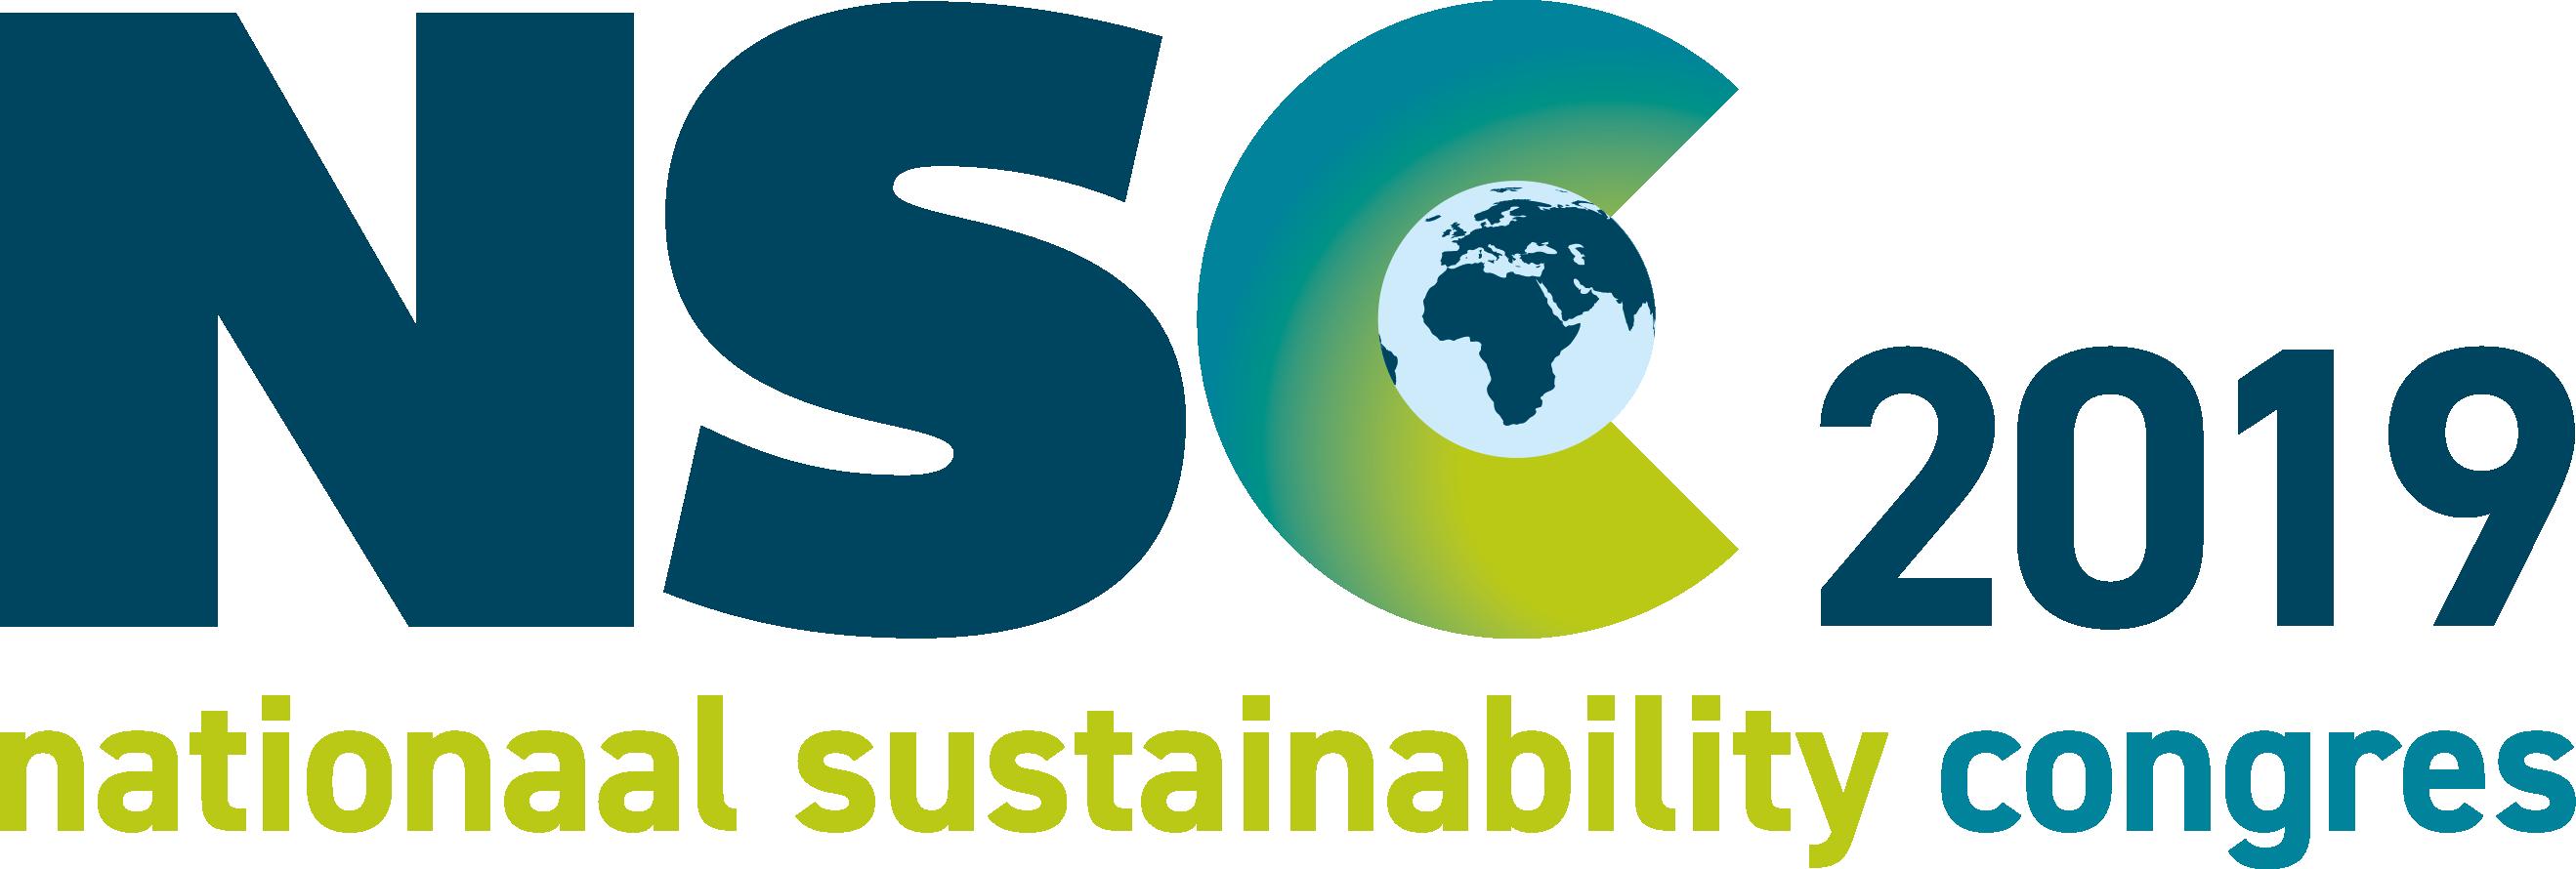 Nationaal Sustainability Congres